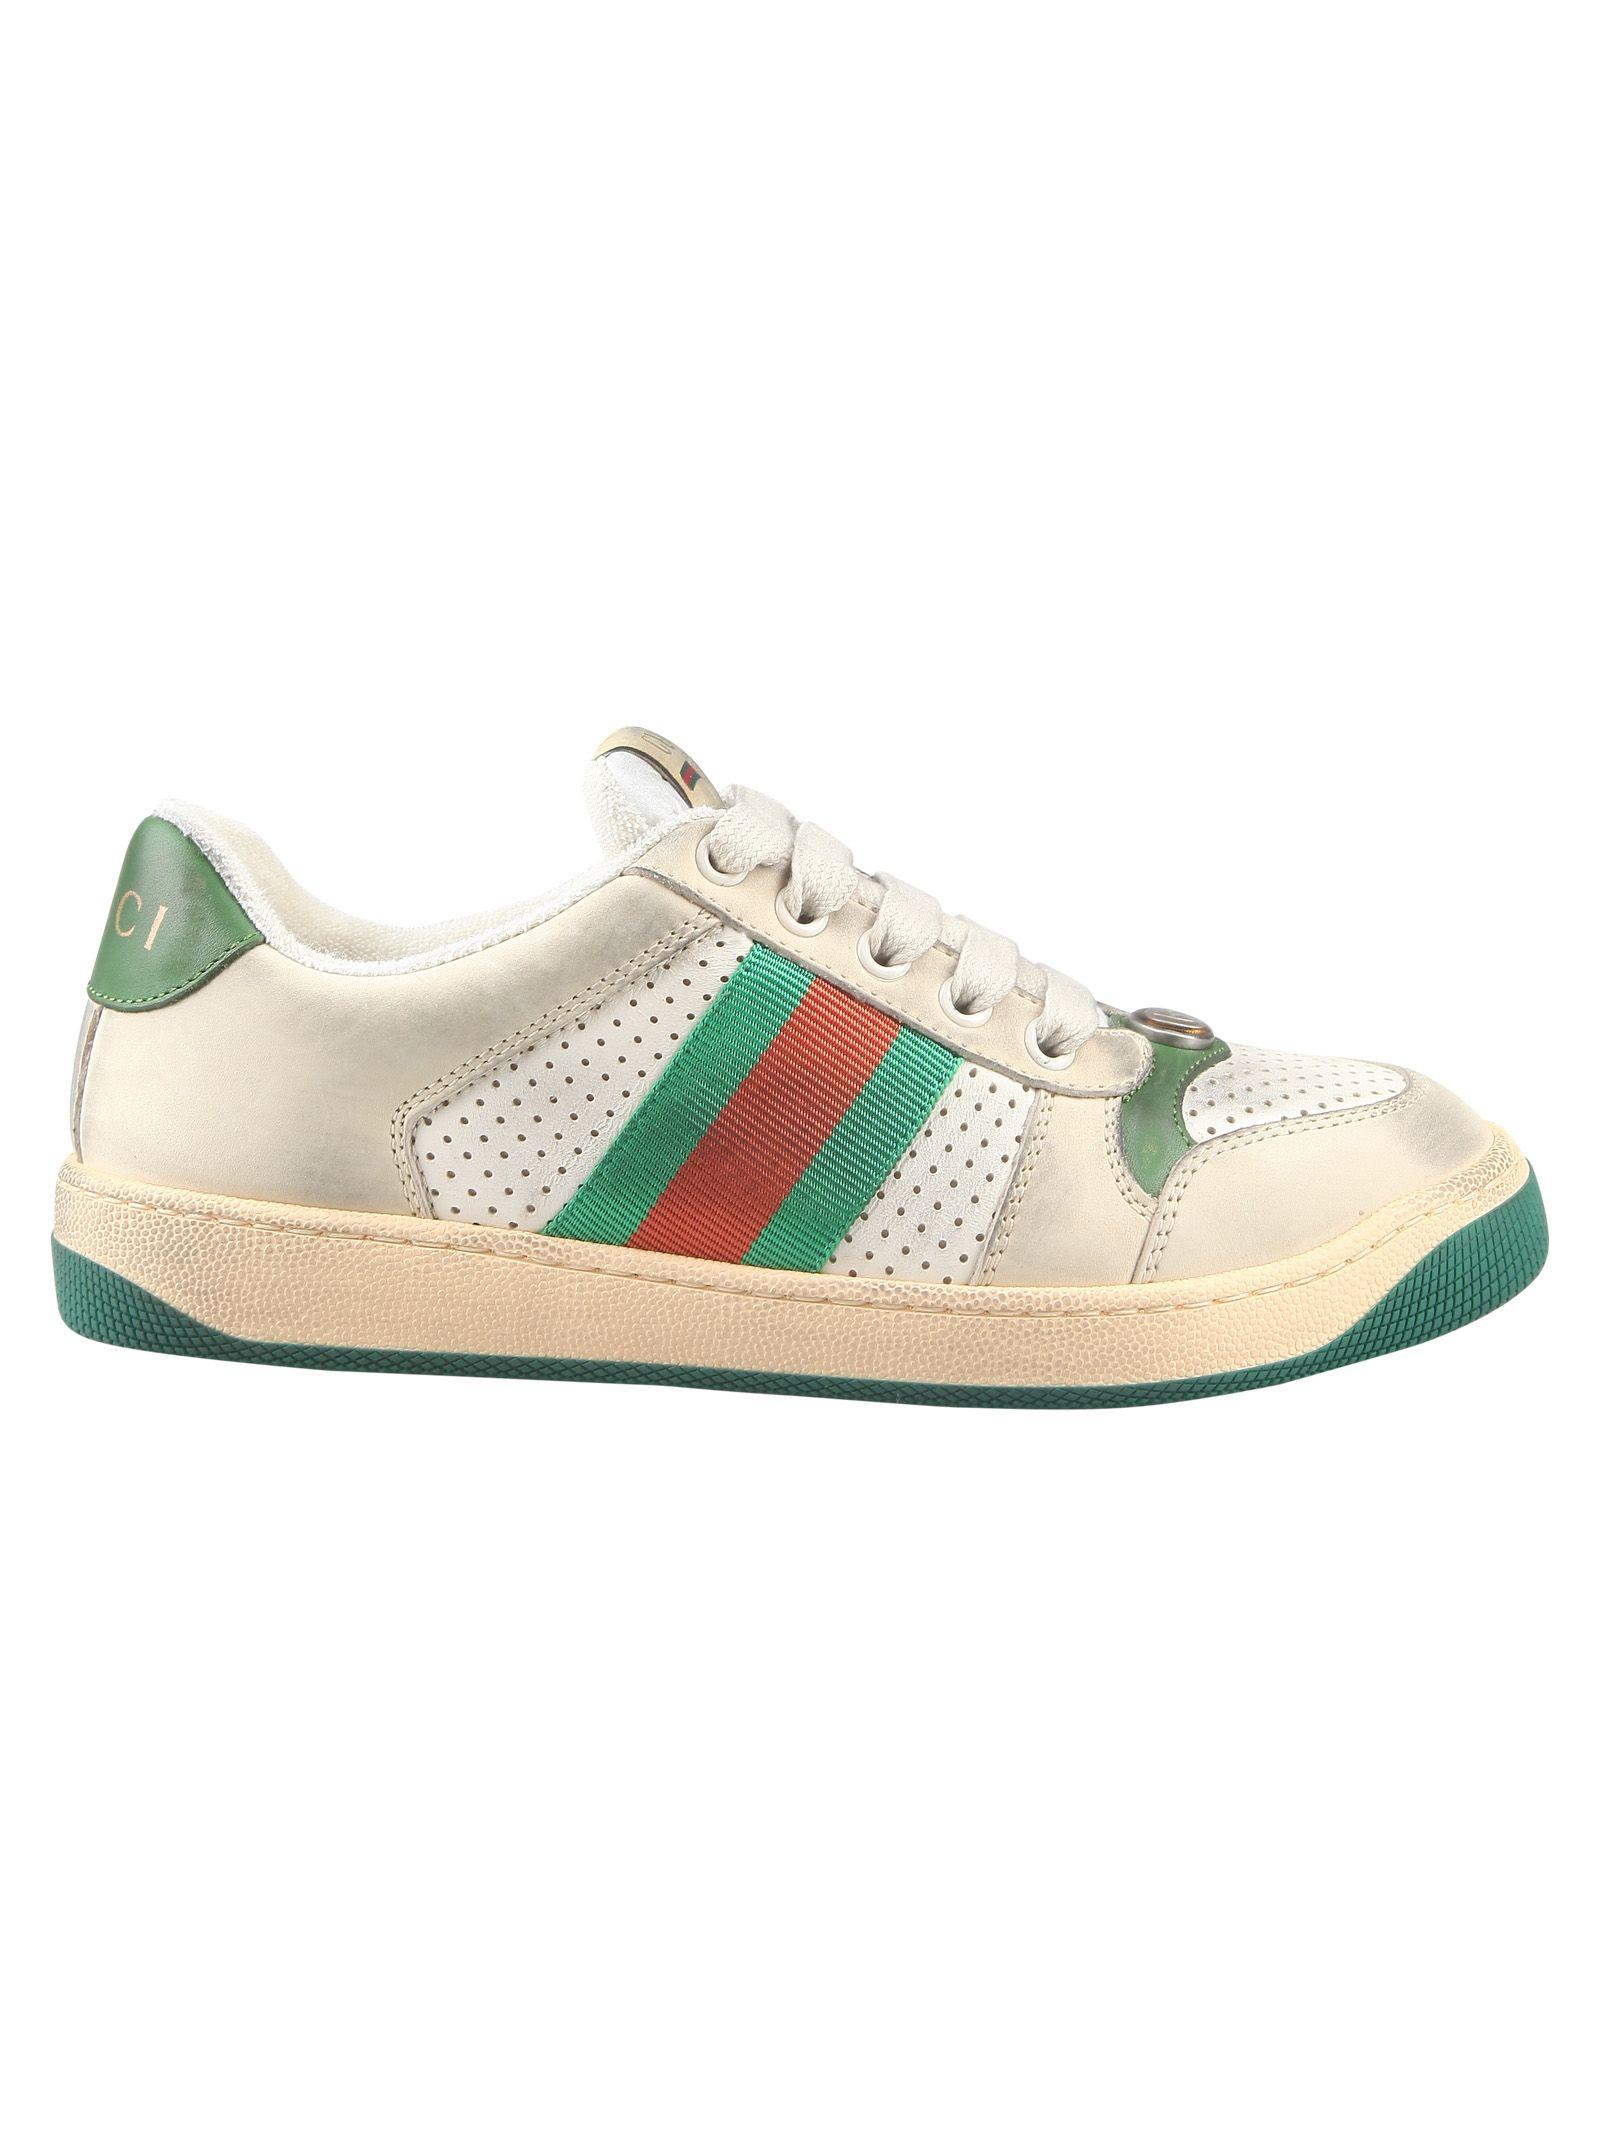 b8a9b3173c4 Gucci Gucci Screener Sneakers - Basic - 10885236